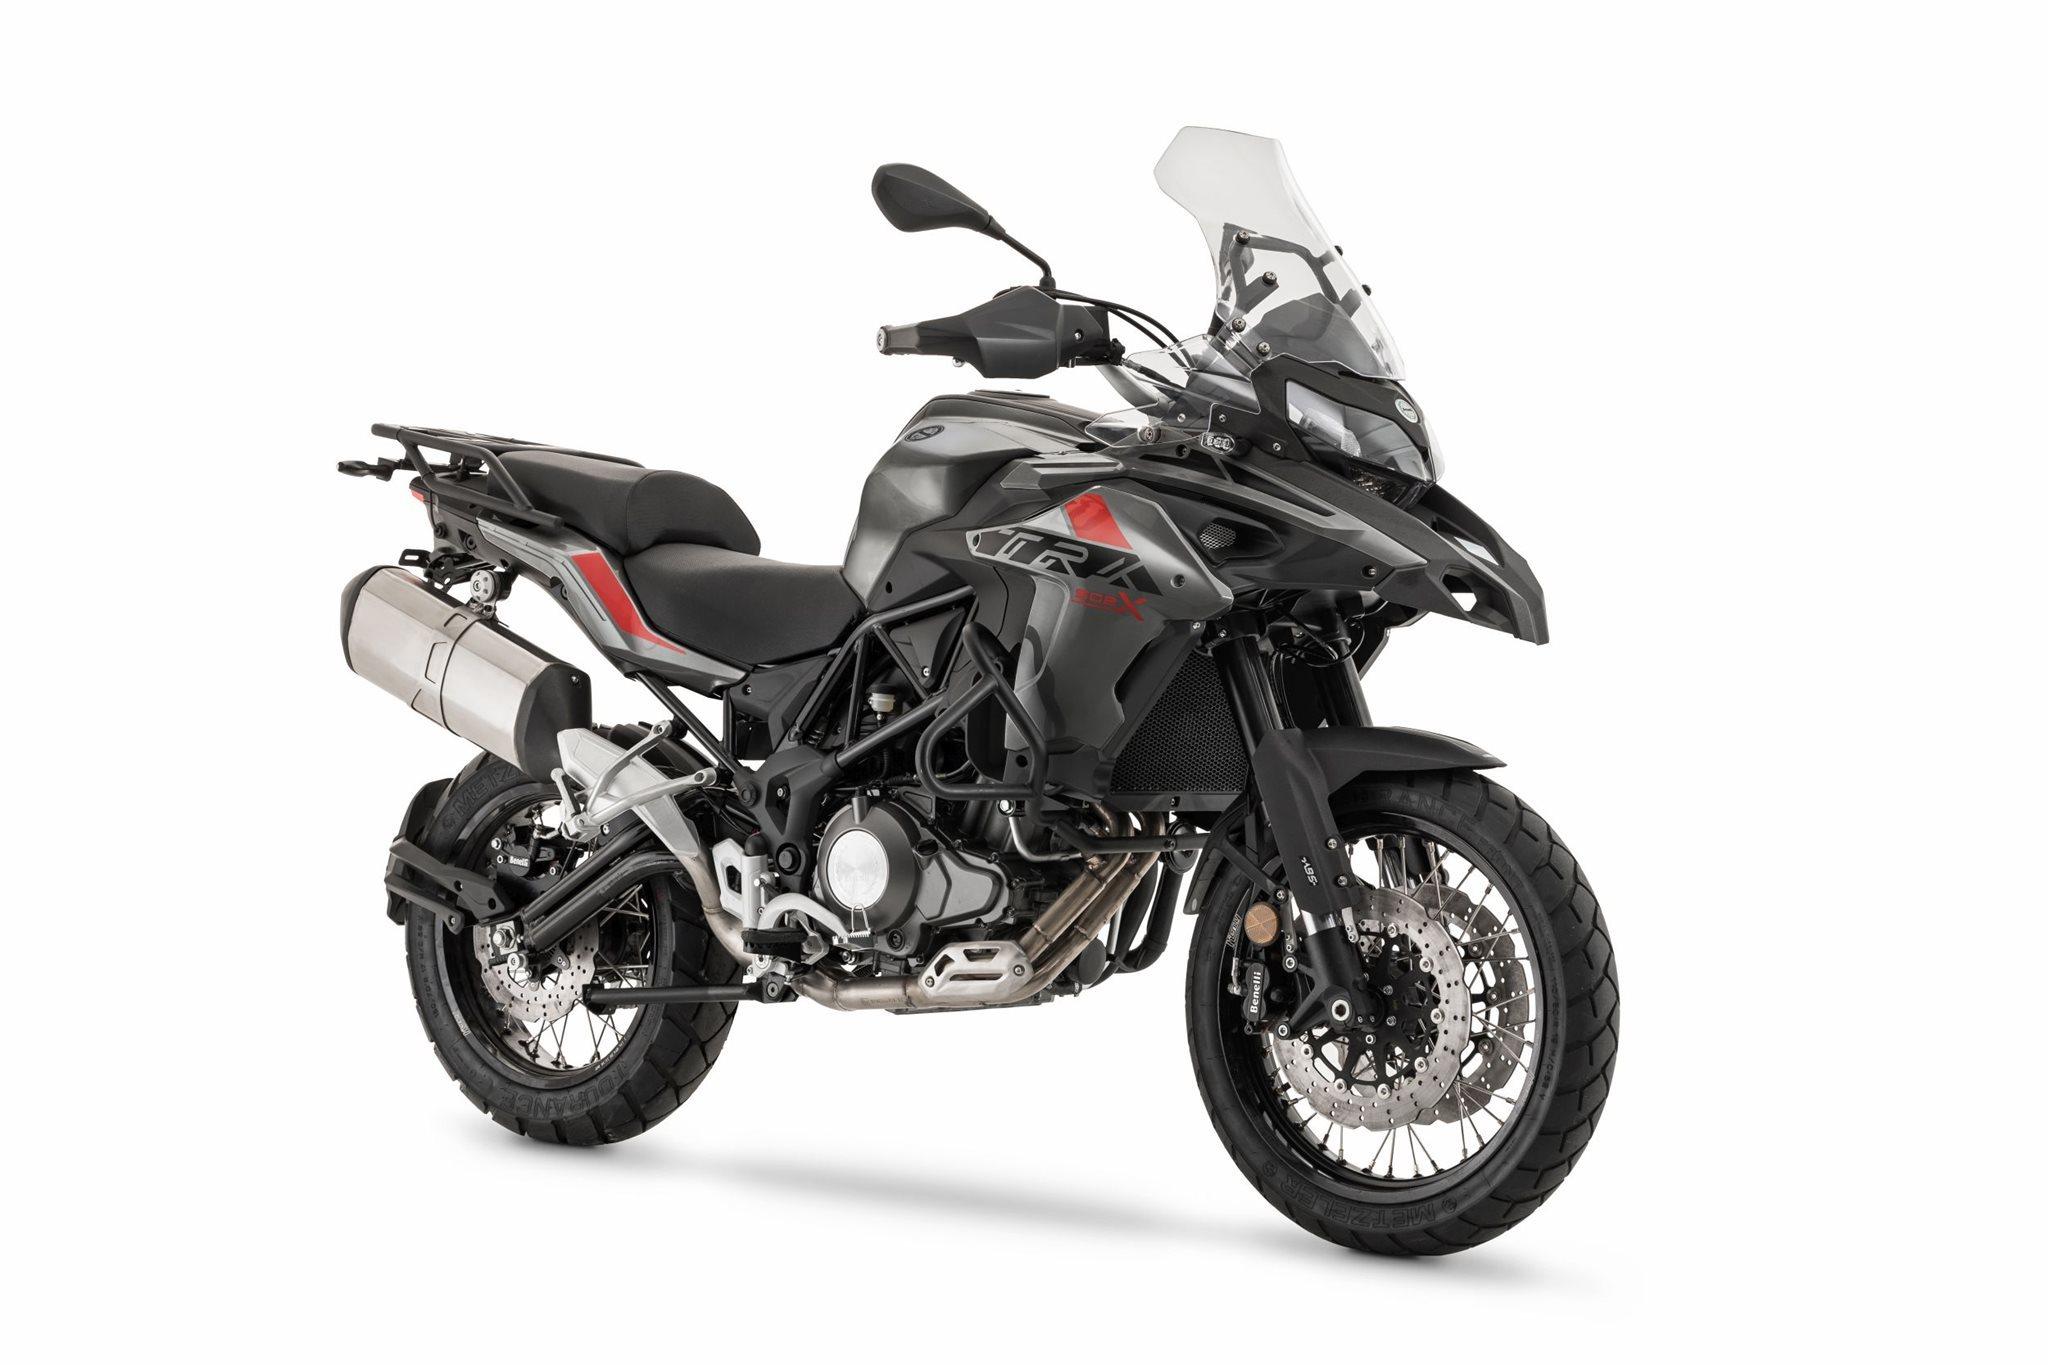 Benelli TRK 502 X Motorrad, neu